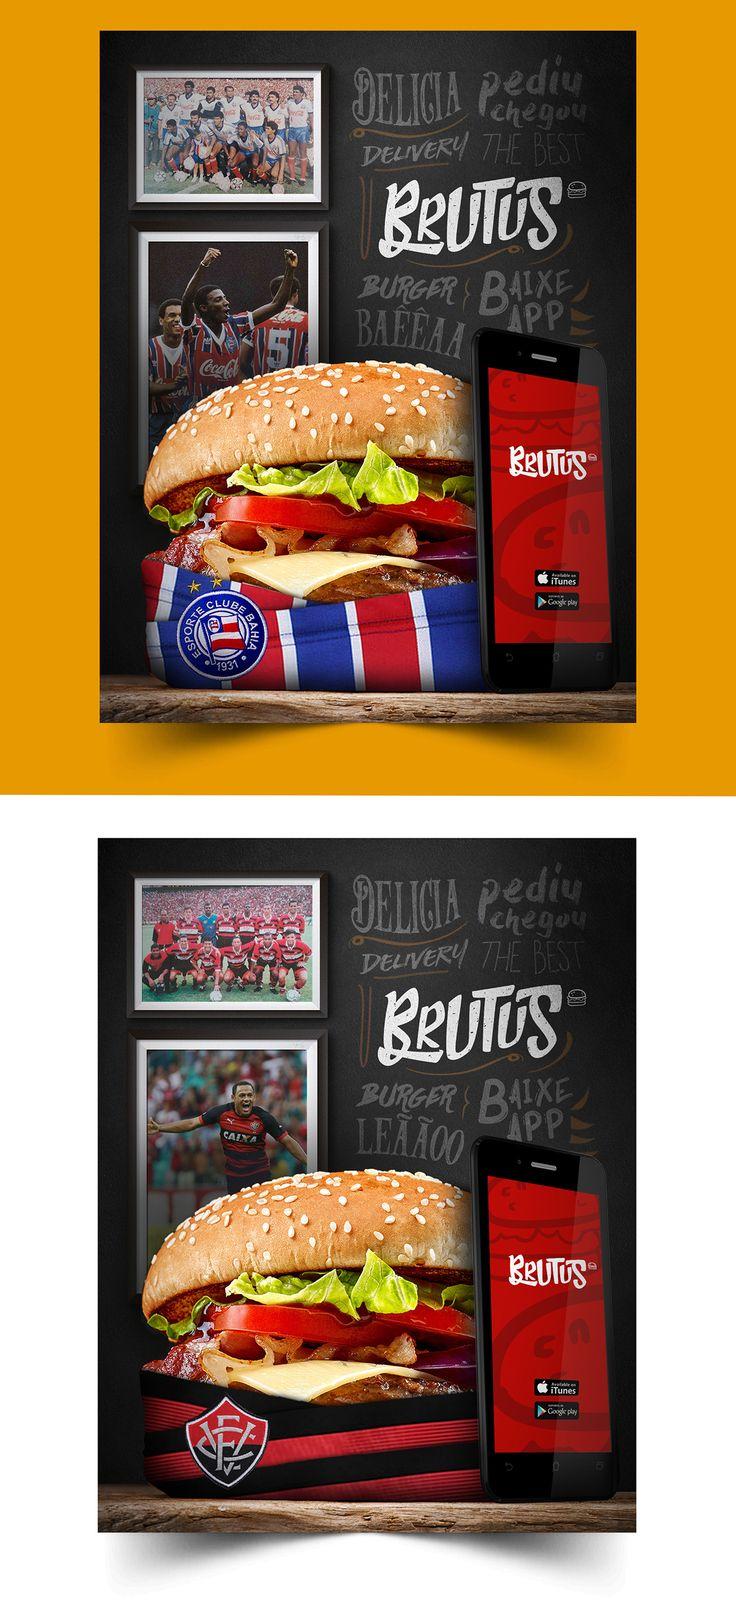 Brutus Burger - Delivery on Behance